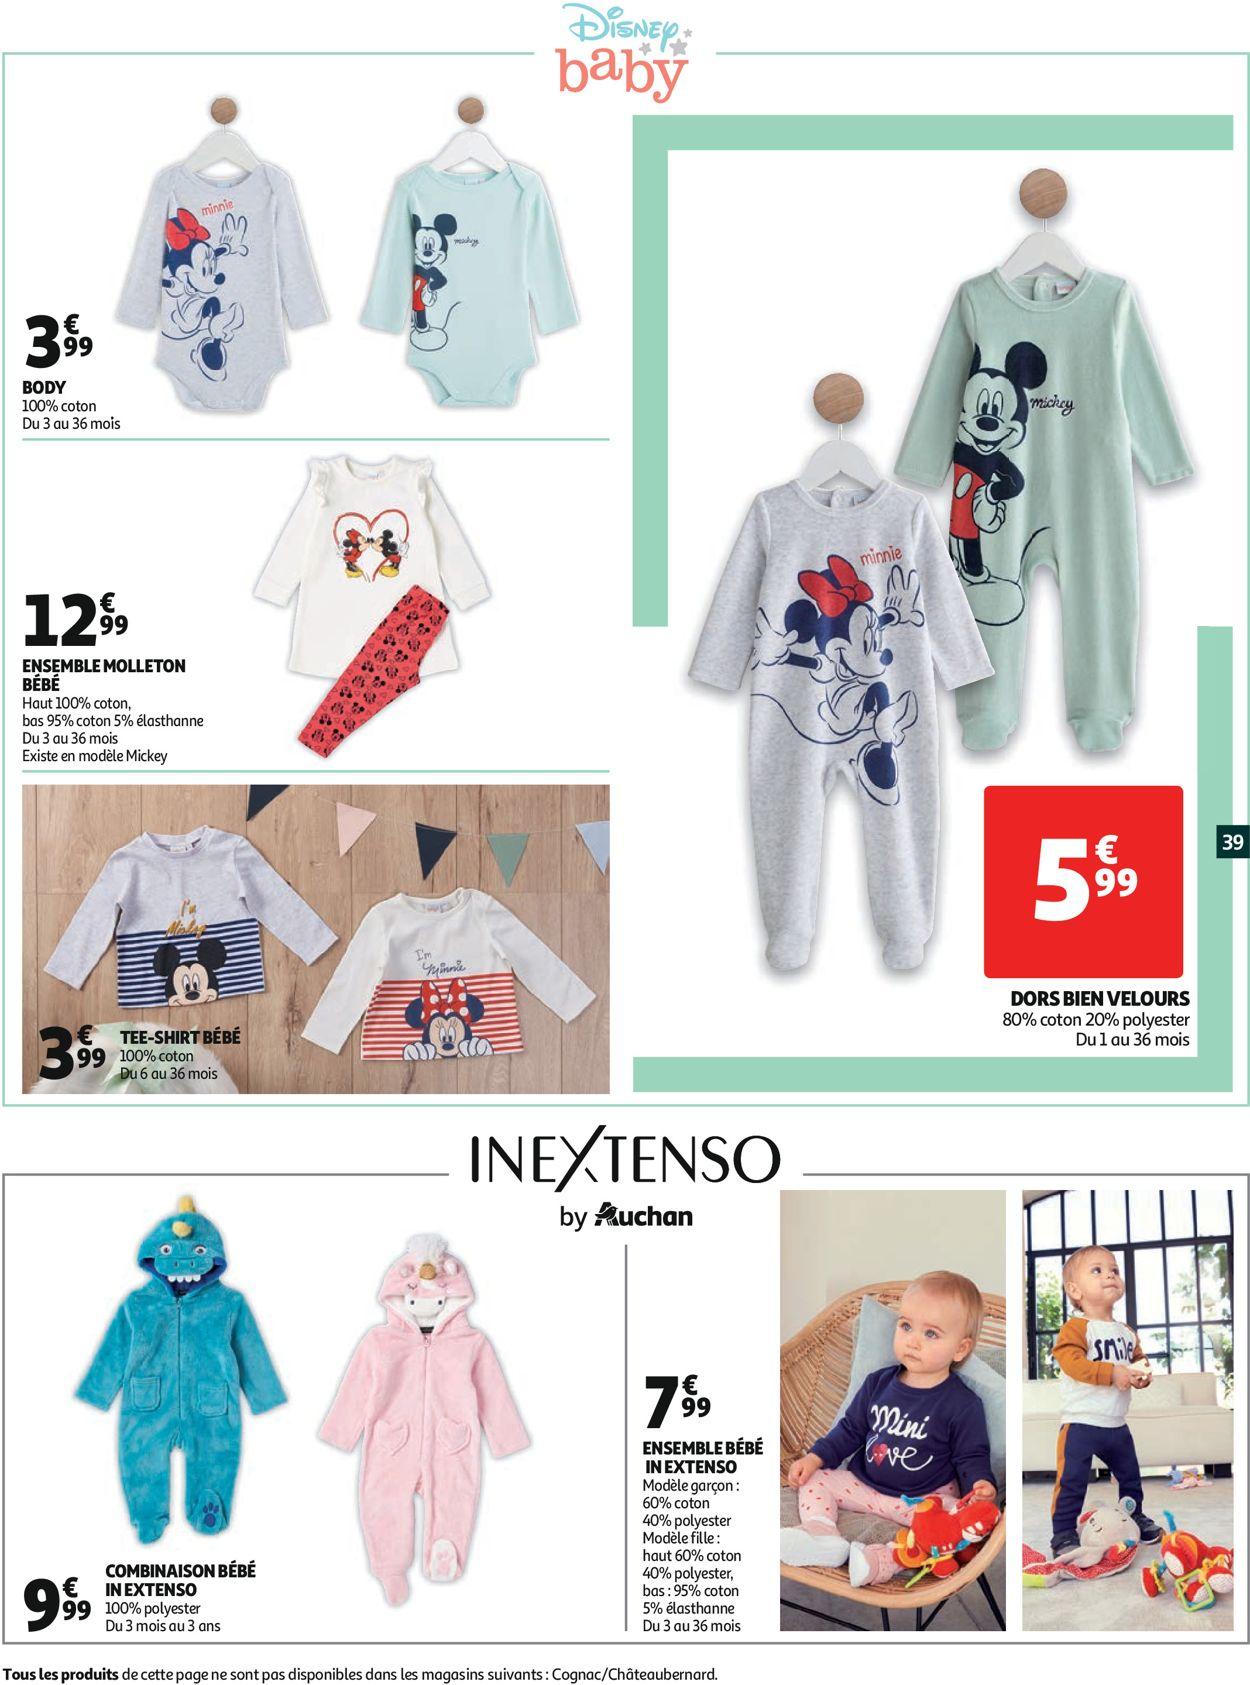 Auchan Catalogue - 02.09-08.09.2020 (Page 39)